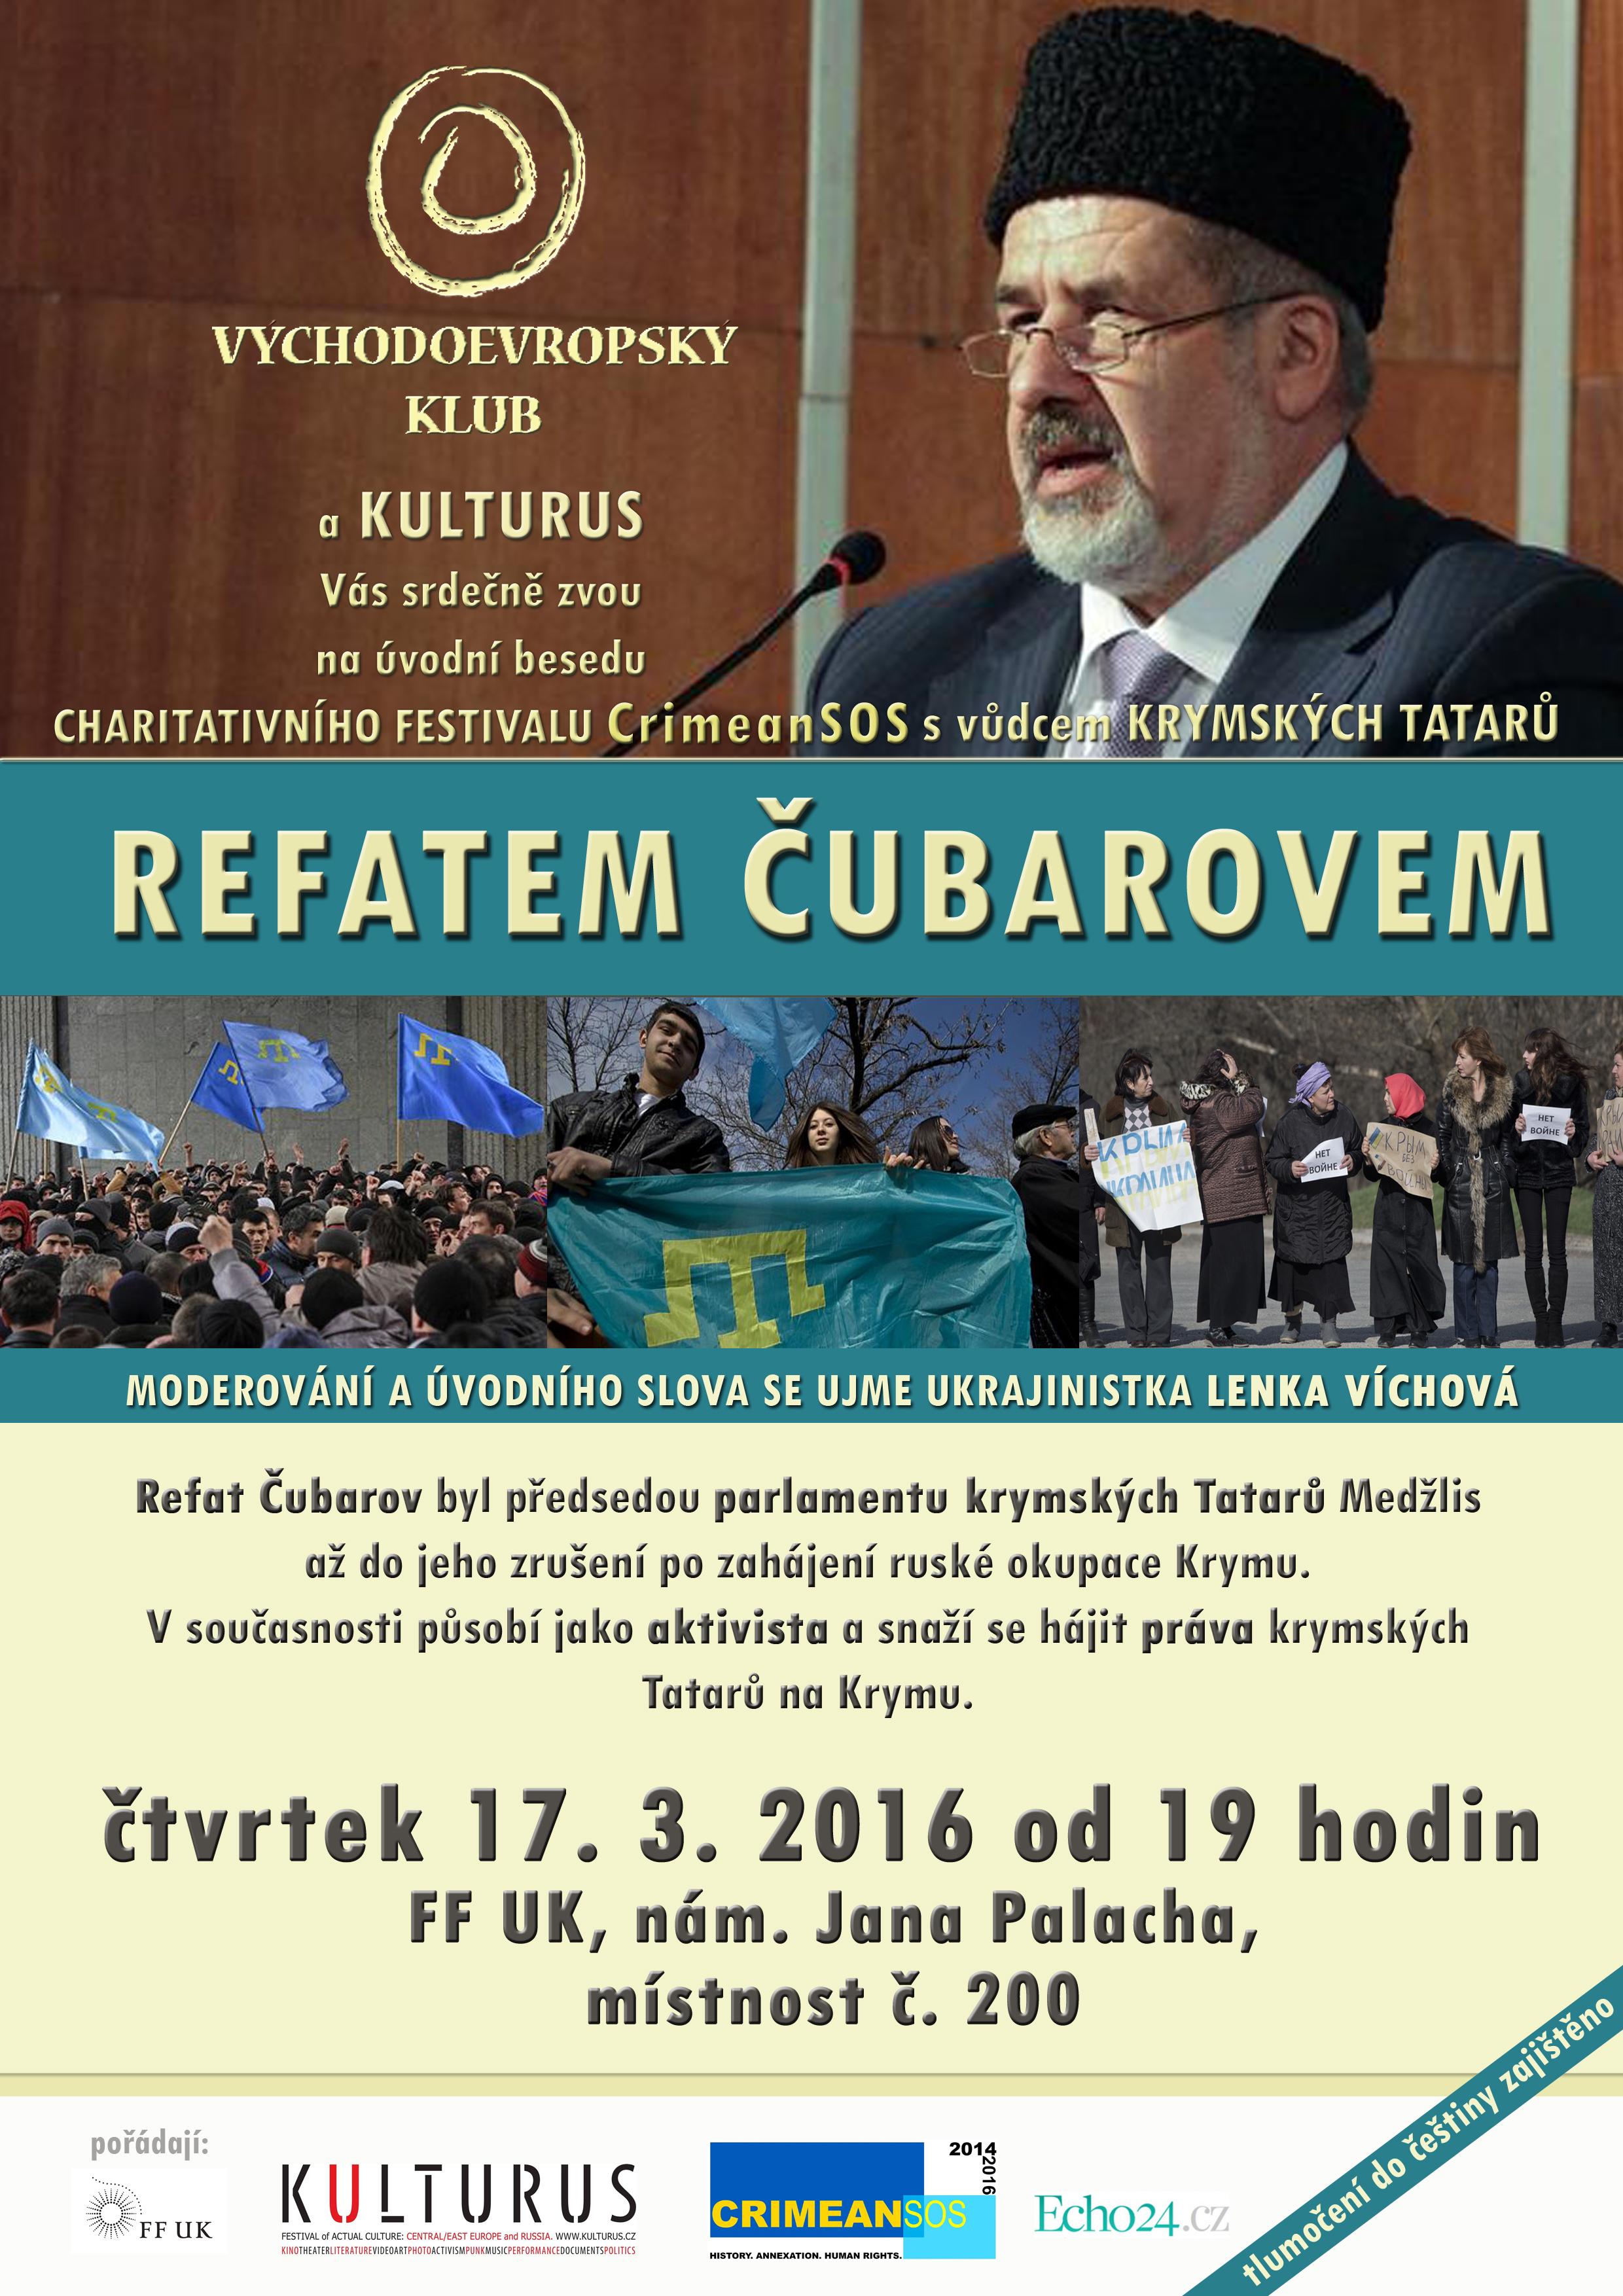 vůdce krymských Tatarů Refat Čubarov